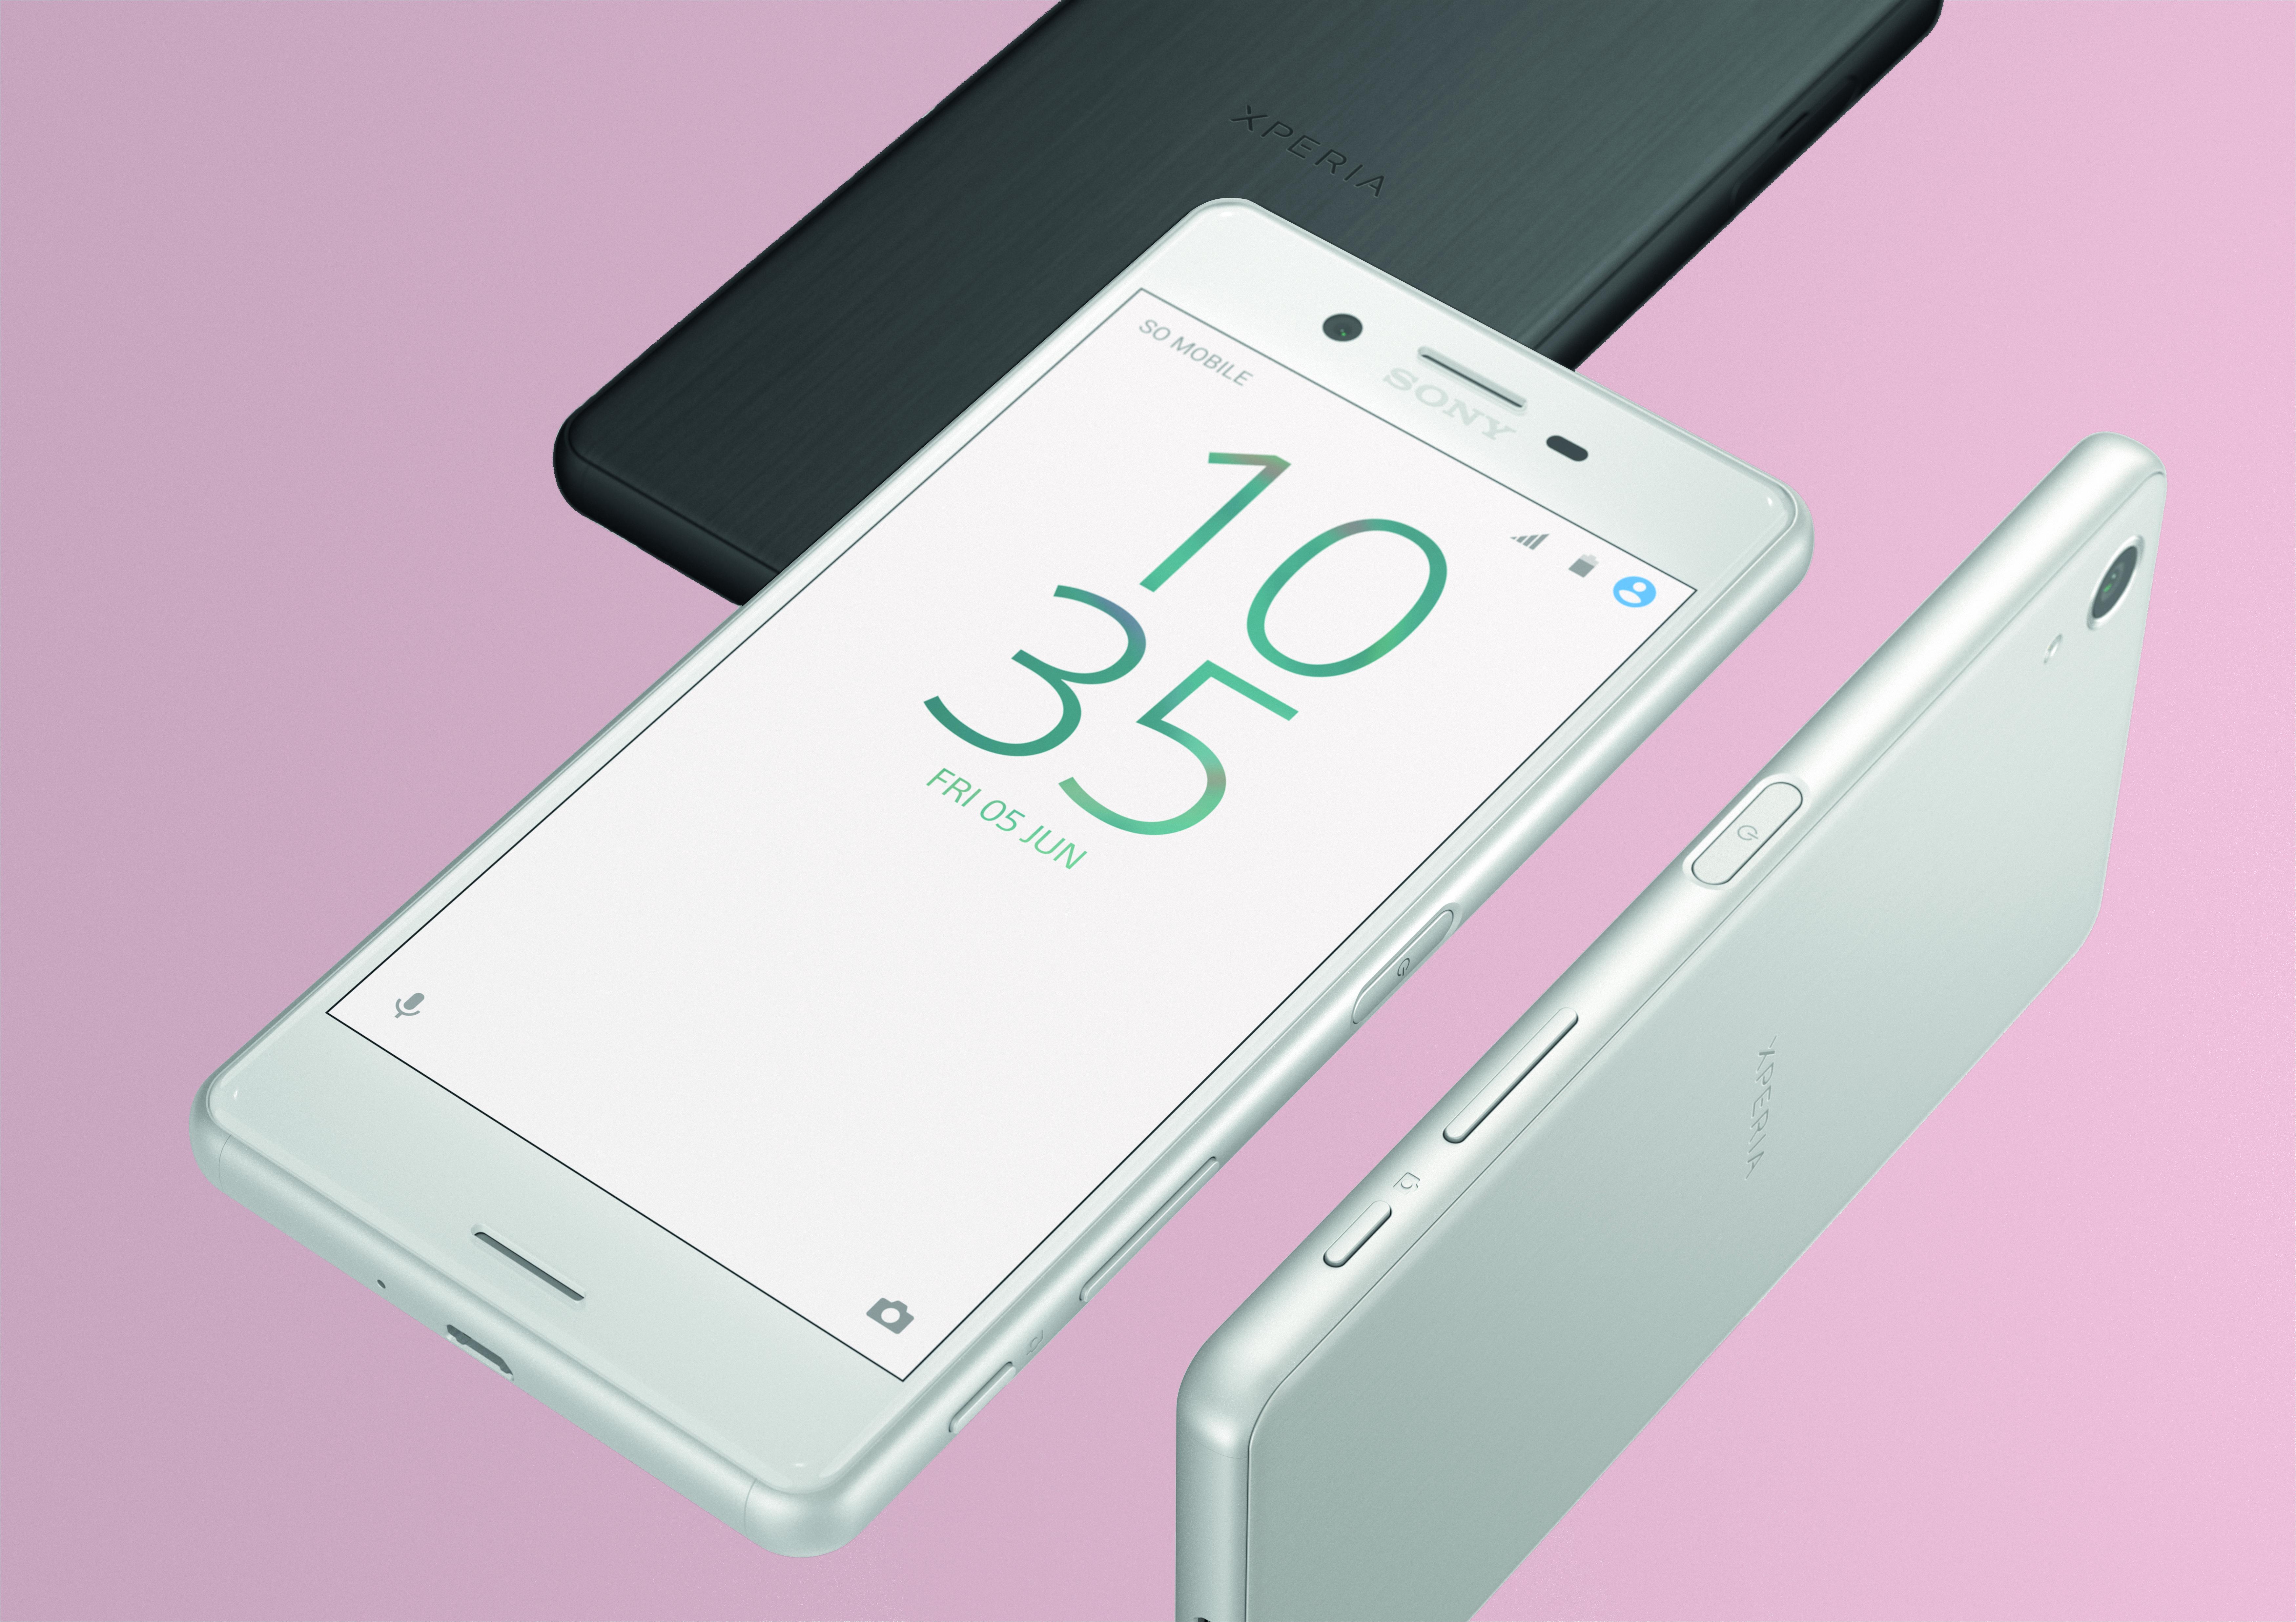 Sony Xperia XA_black and white_compo3